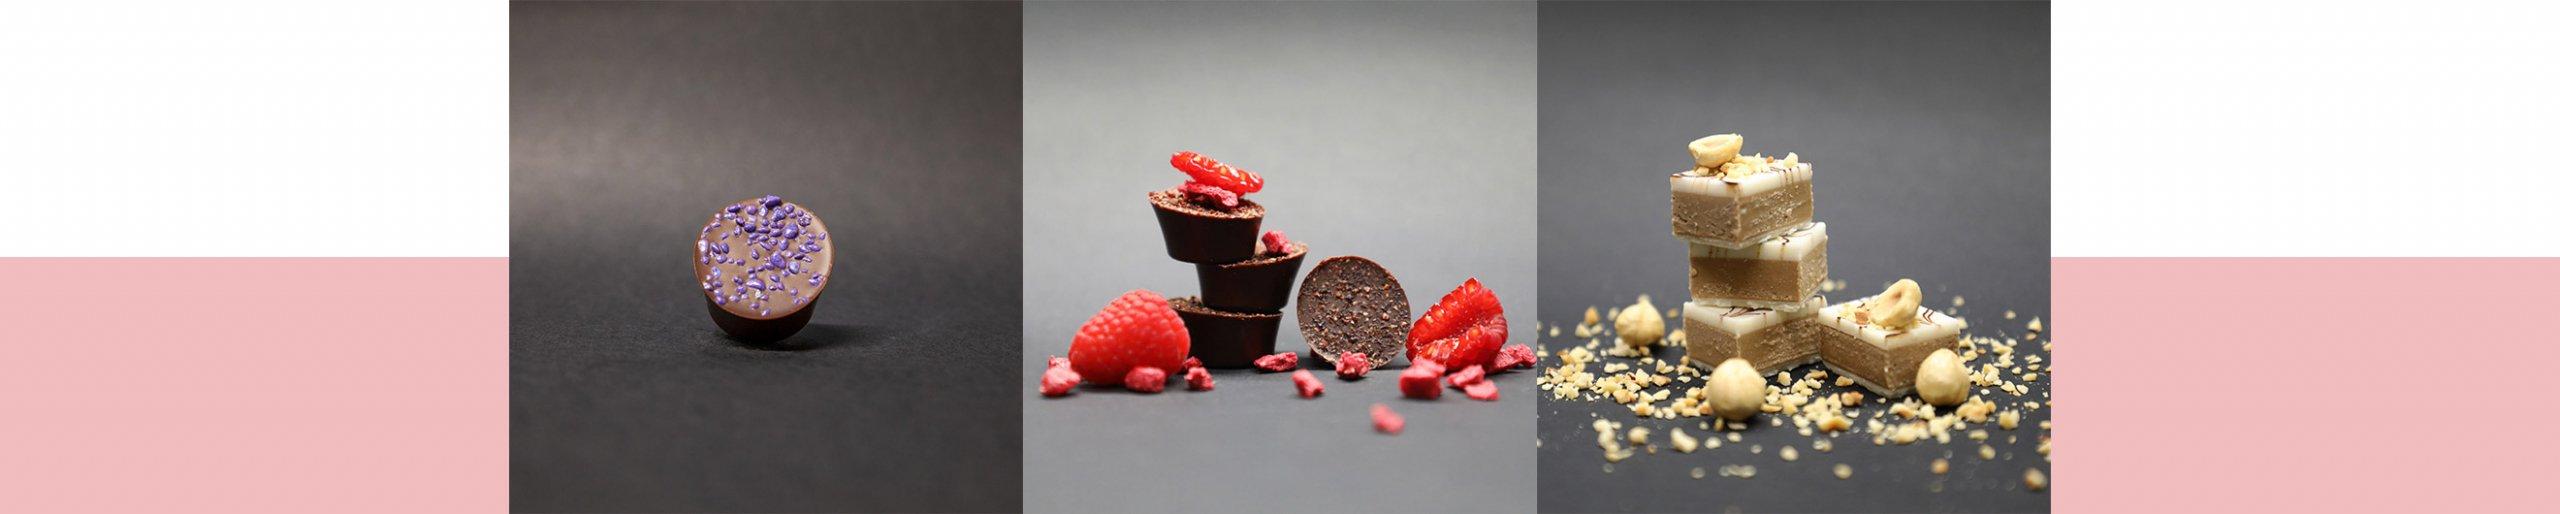 cioccolateria gallery